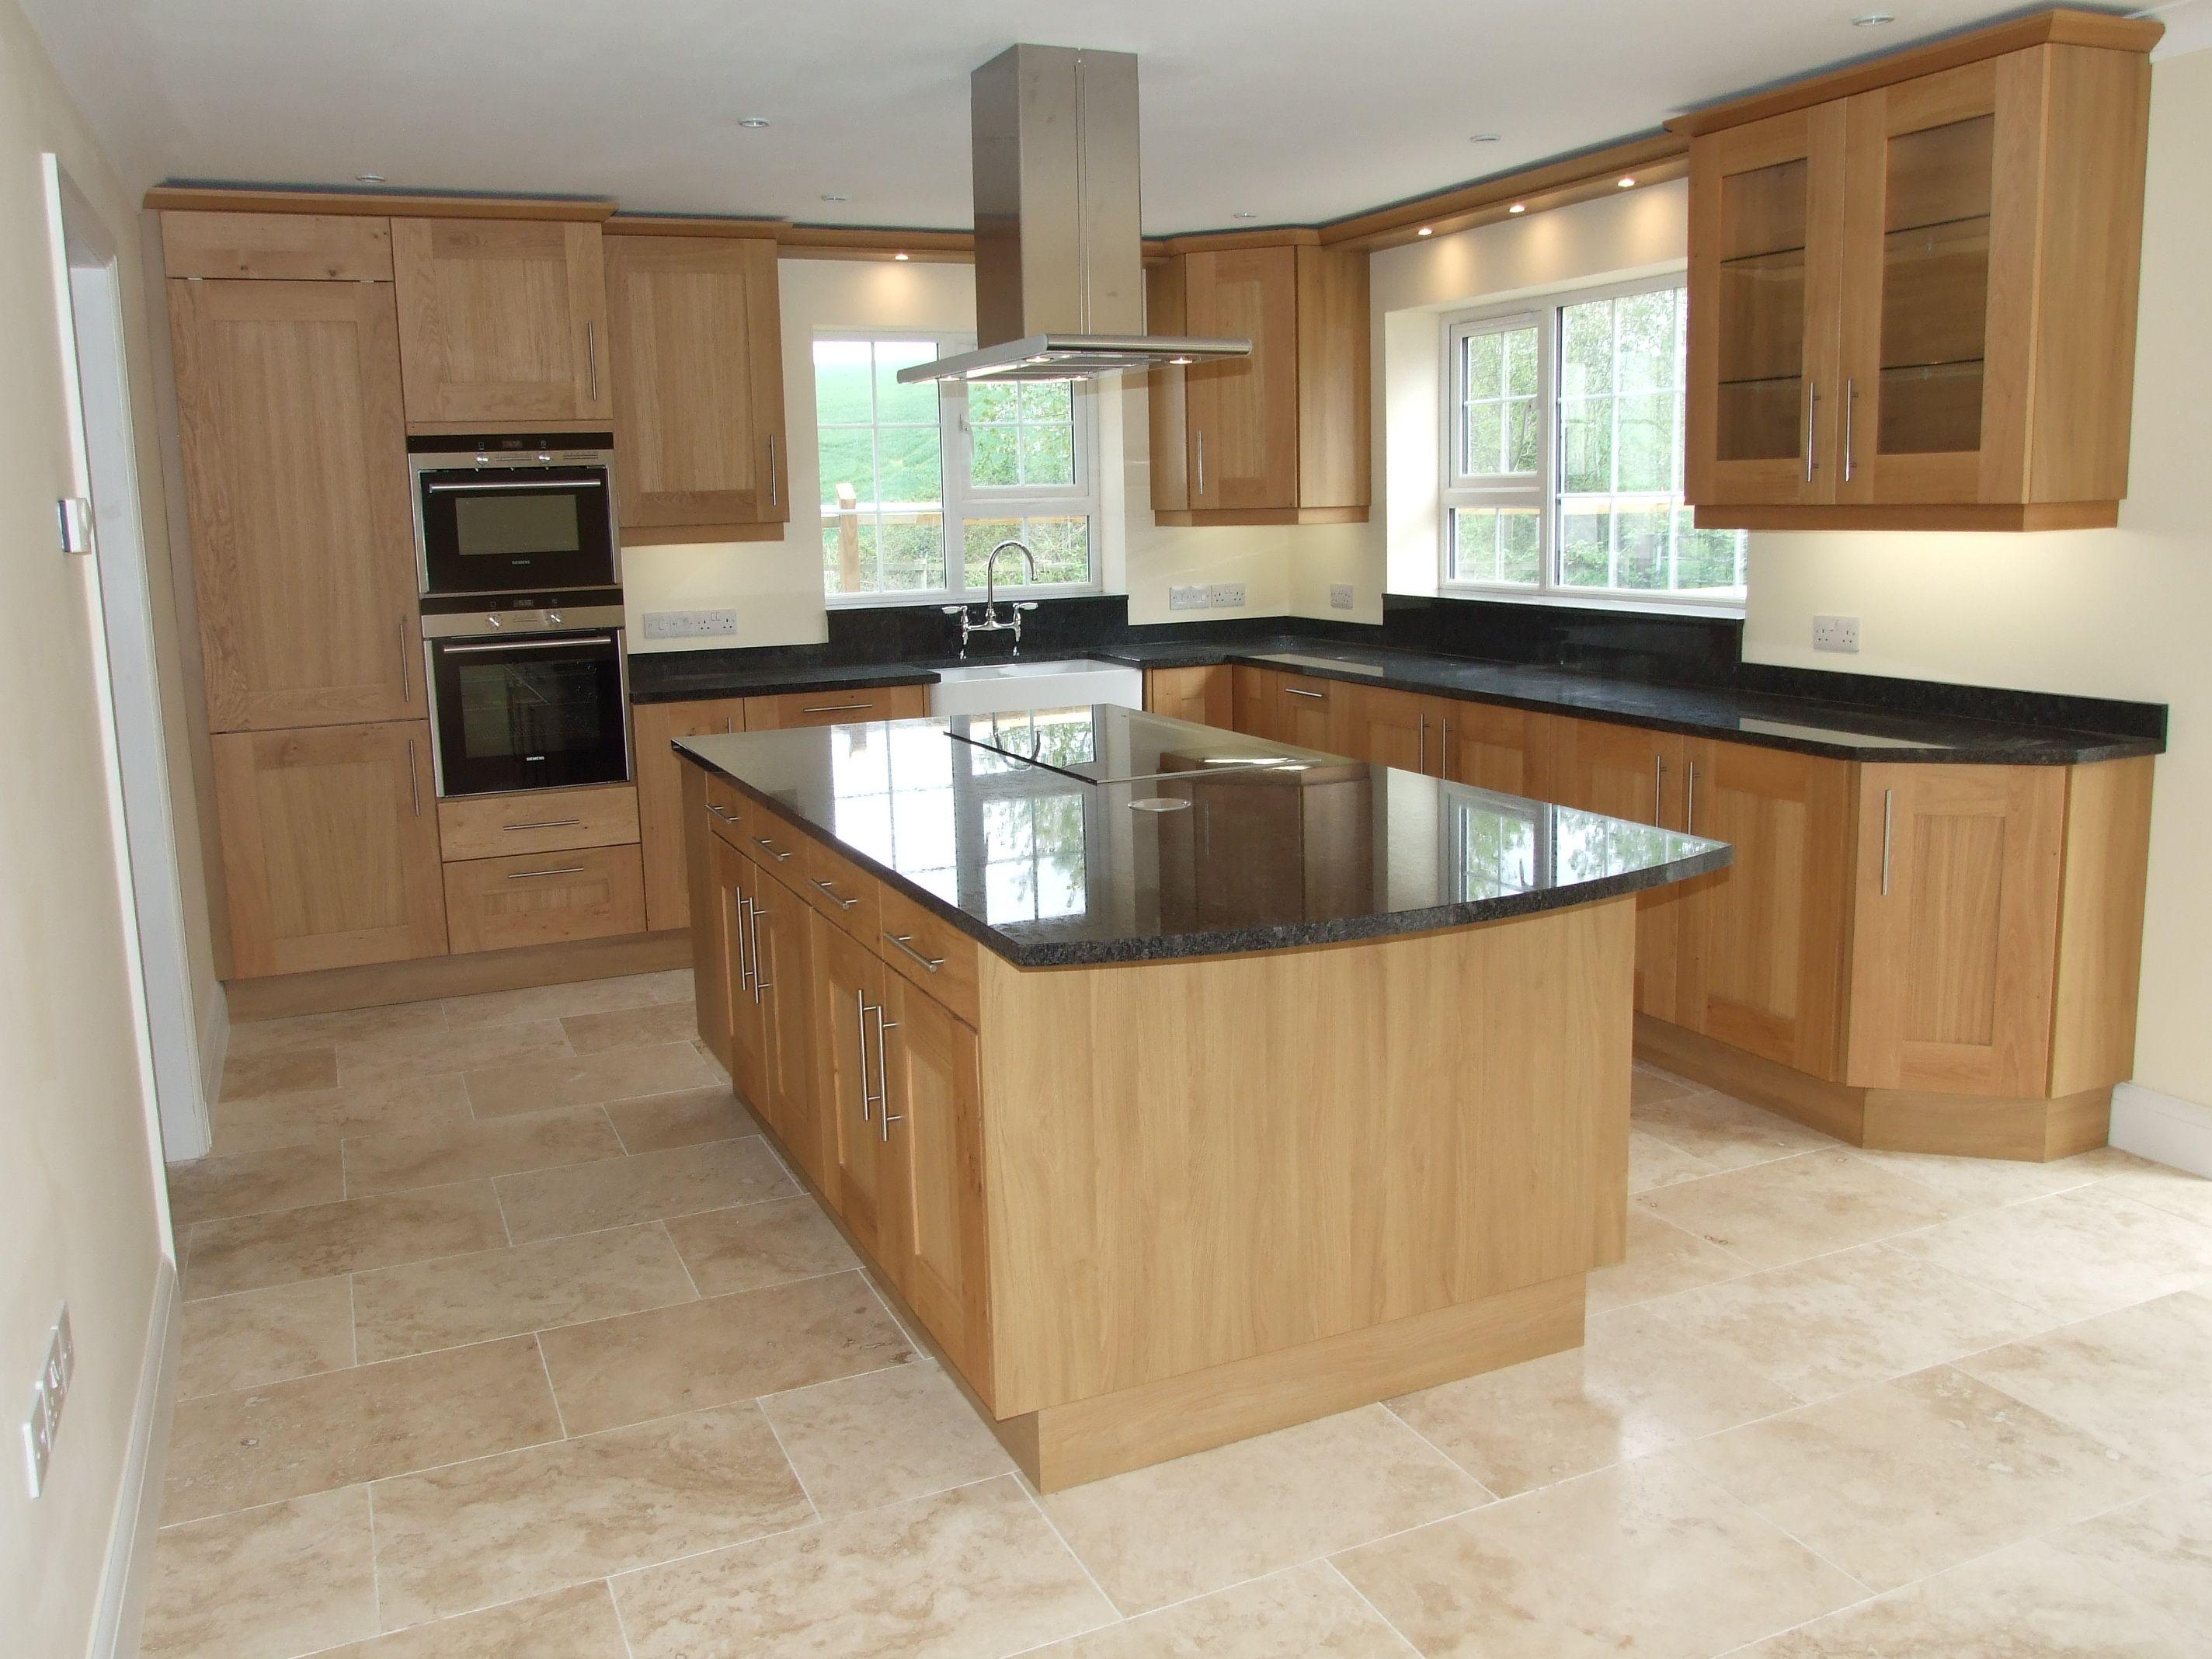 oak kitchen | kitchen ideas | pinterest | solid wood kitchens